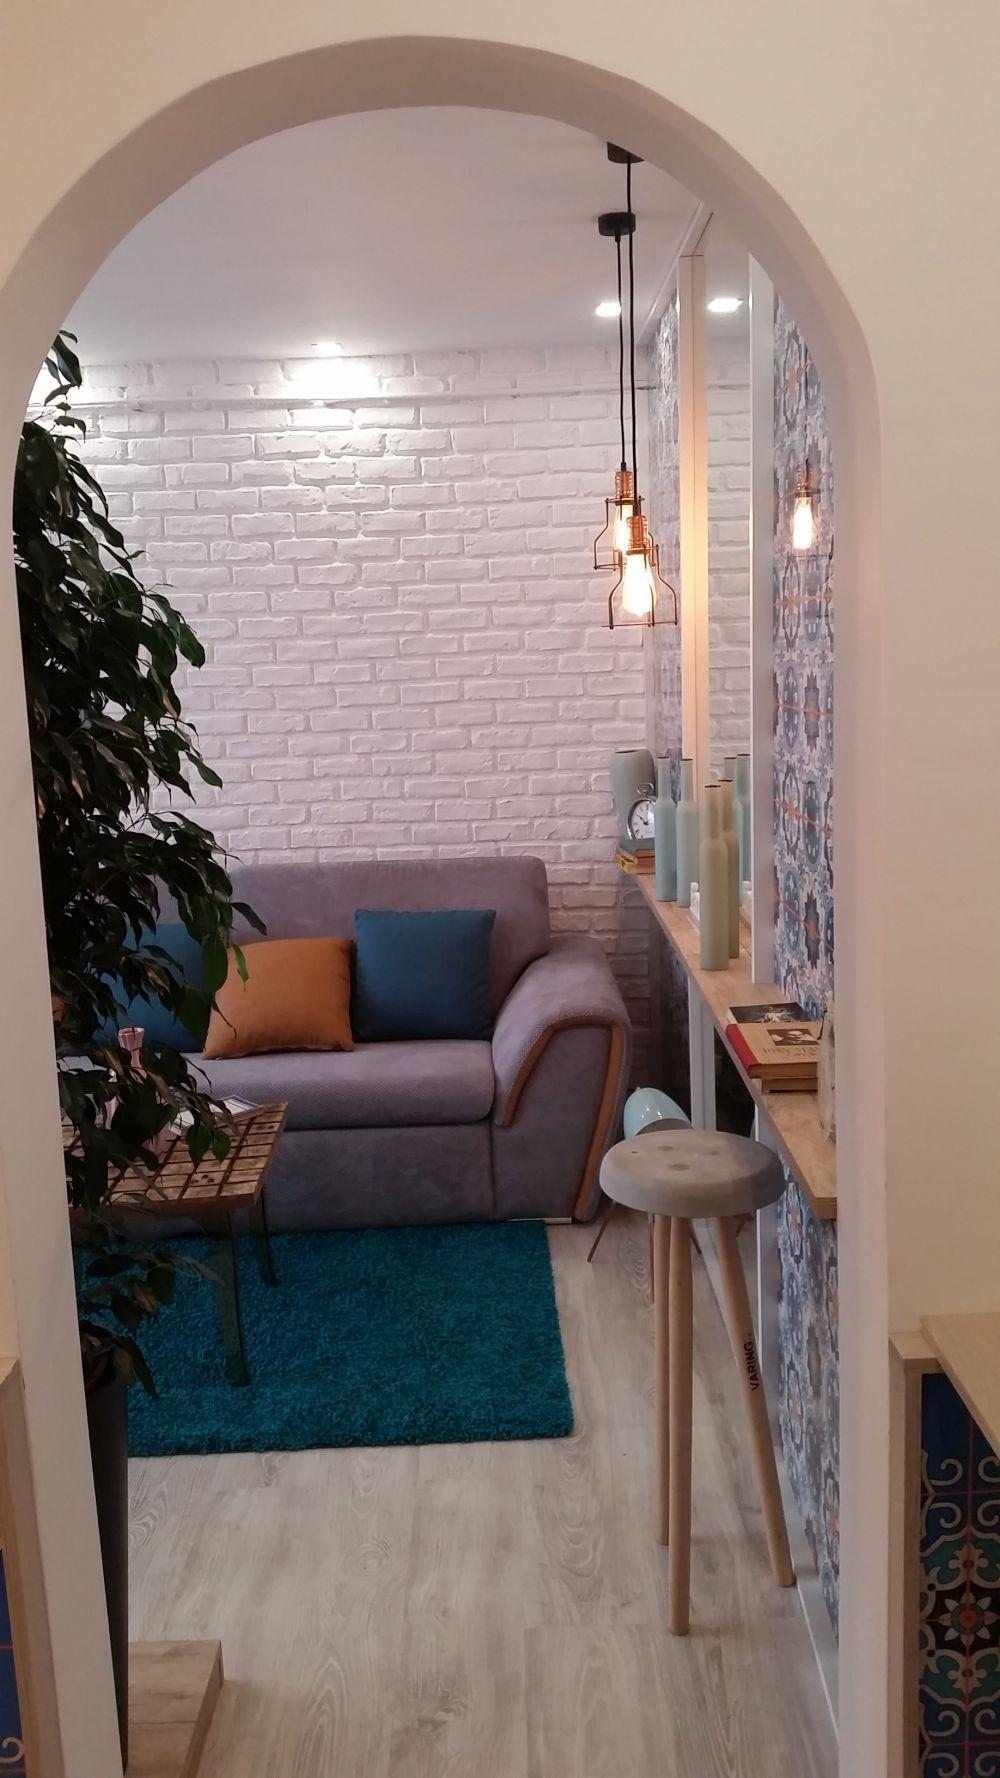 adelaparvu-com-despre-apartamentul-familiei-tudorache-ploiesti-episodul-9-sezonul-3-visuri-la-cheie-foto-adela-parvu-20